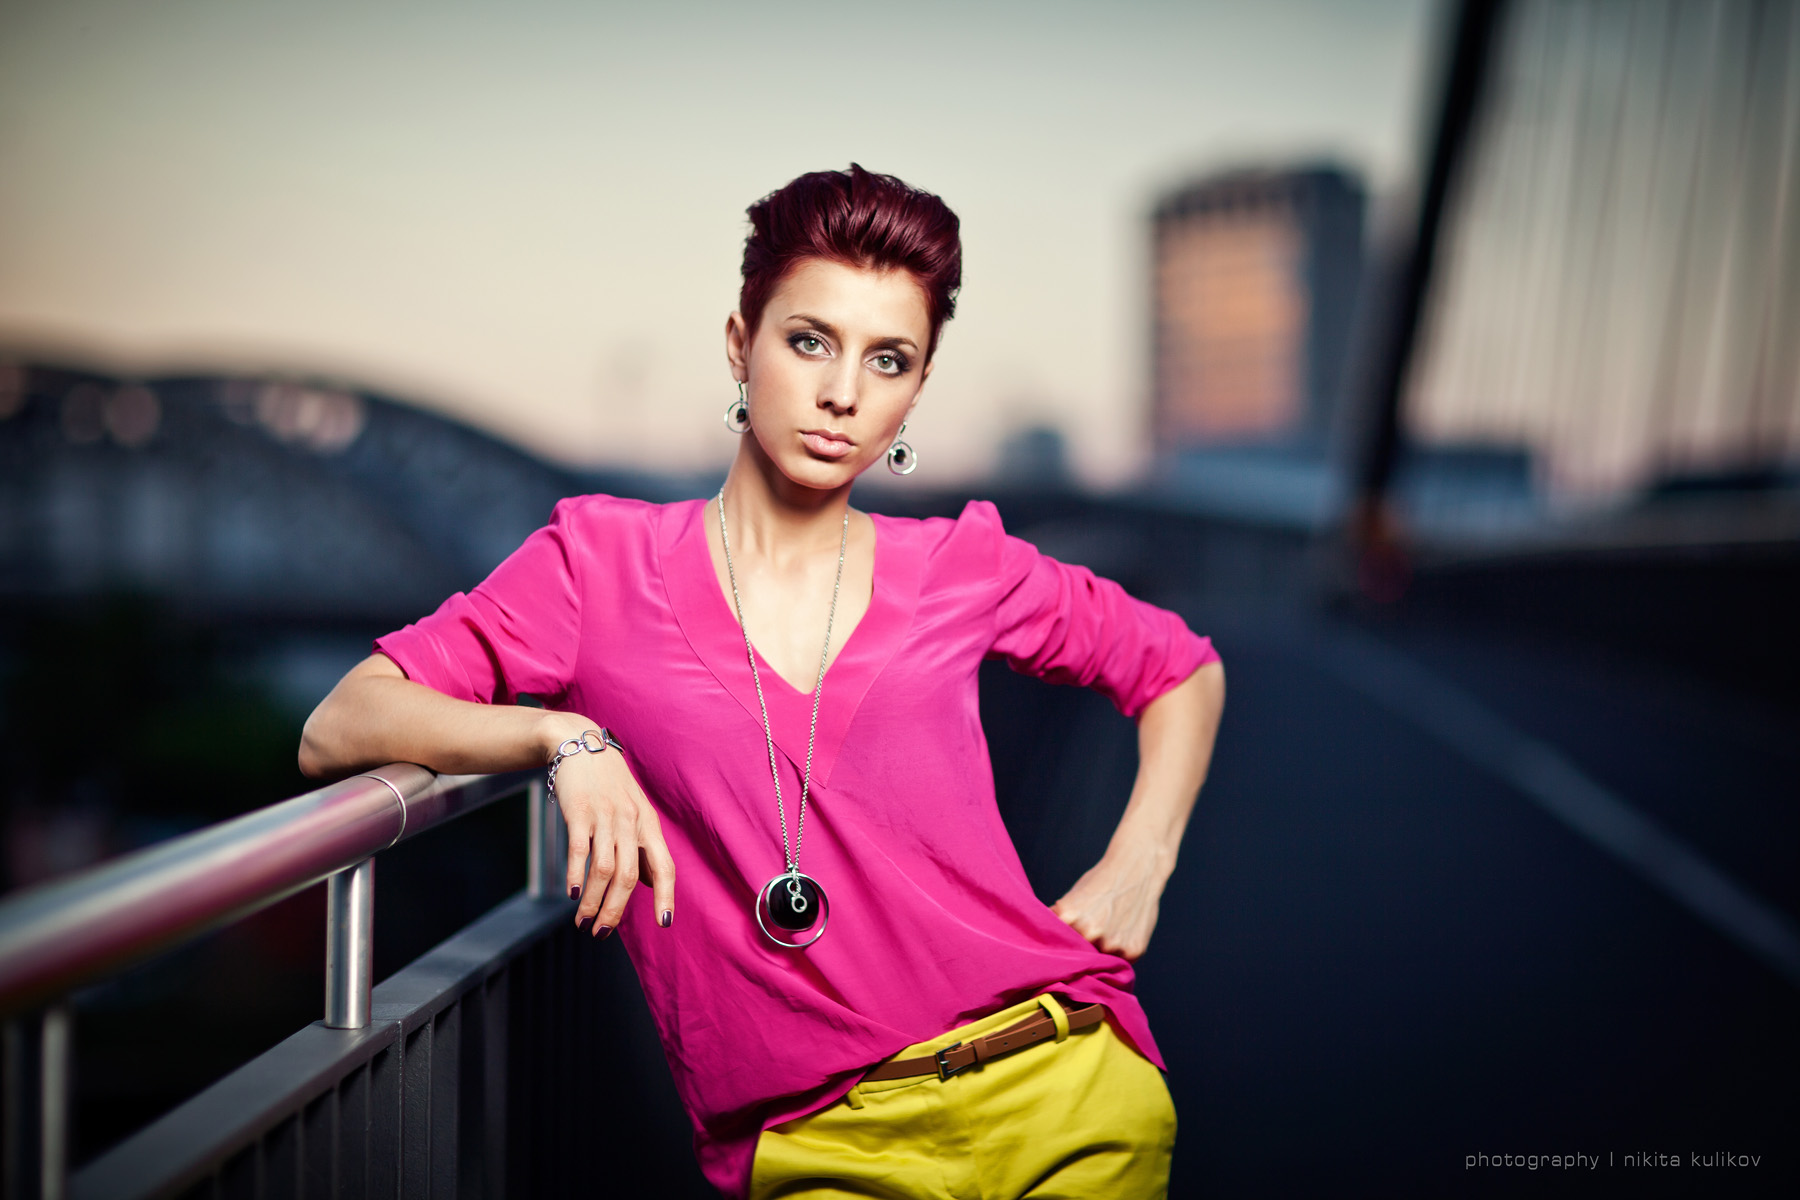 Fotograf Frankfurt / Fashion / Lifestyle / Mode / Style / Werbefotograf /  Nikita Kulikov